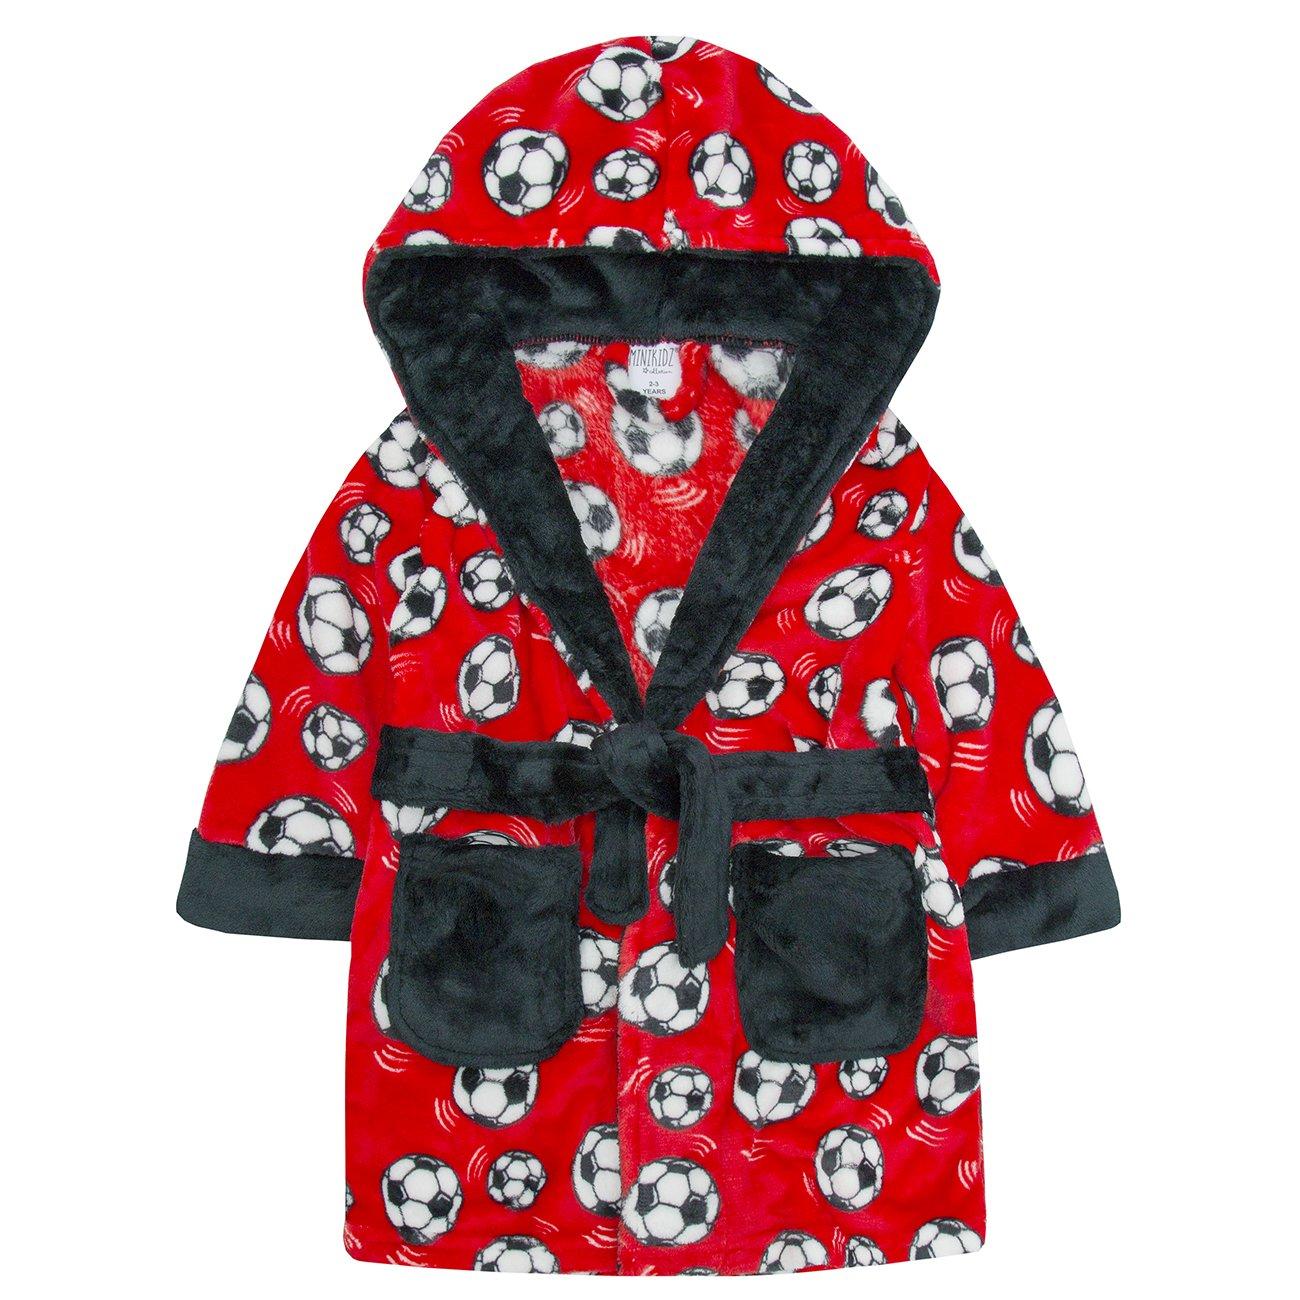 MiniKidz Infant Boys Plush Fleece Football Dressing Gown